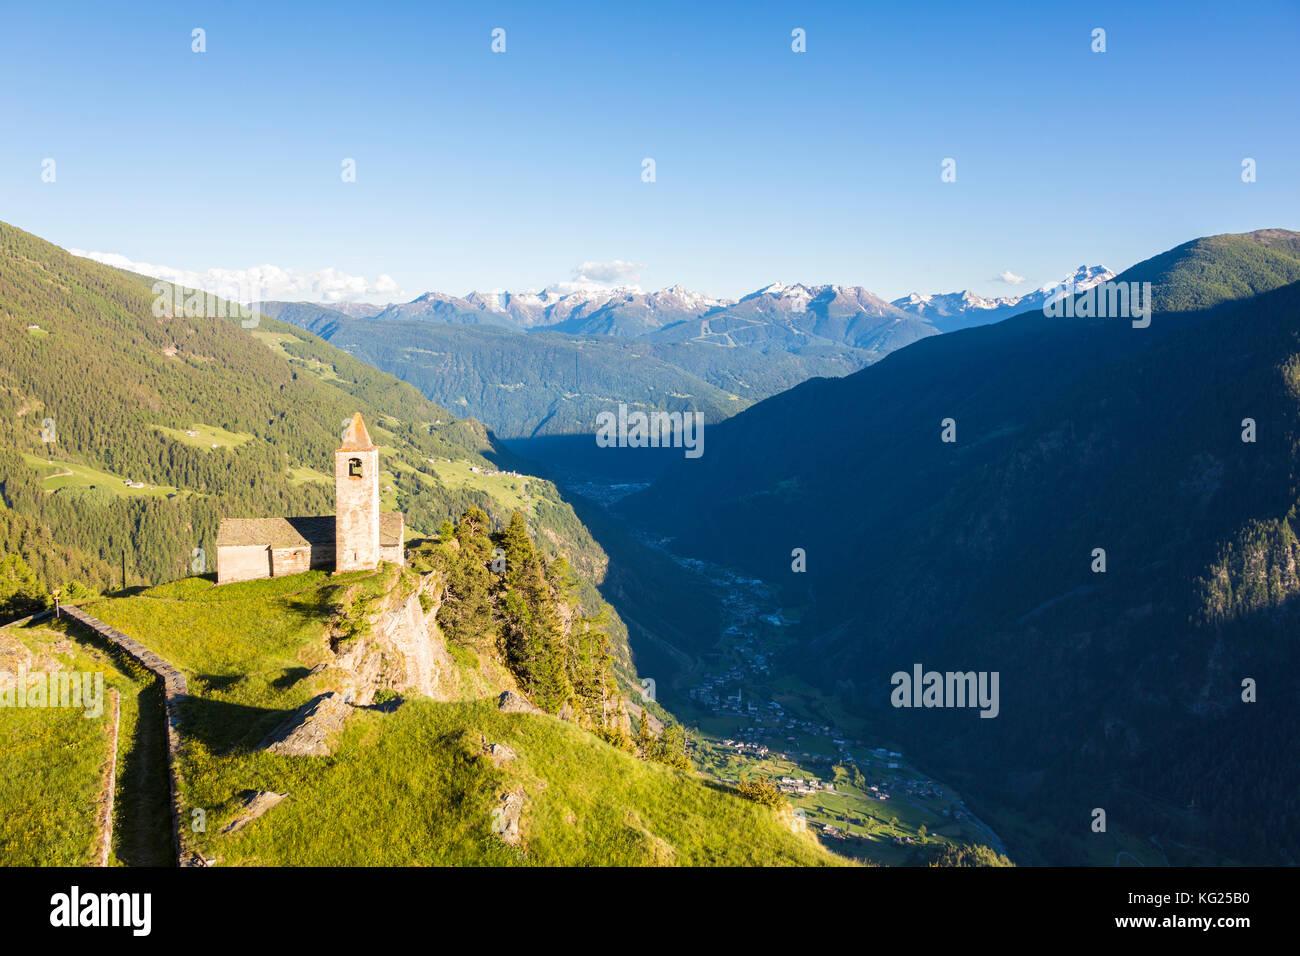 Ancient church perched on mountains, San Romerio Alp, Brusio, Canton of Graubunden, Poschiavo Valley, Switzerland, - Stock Image